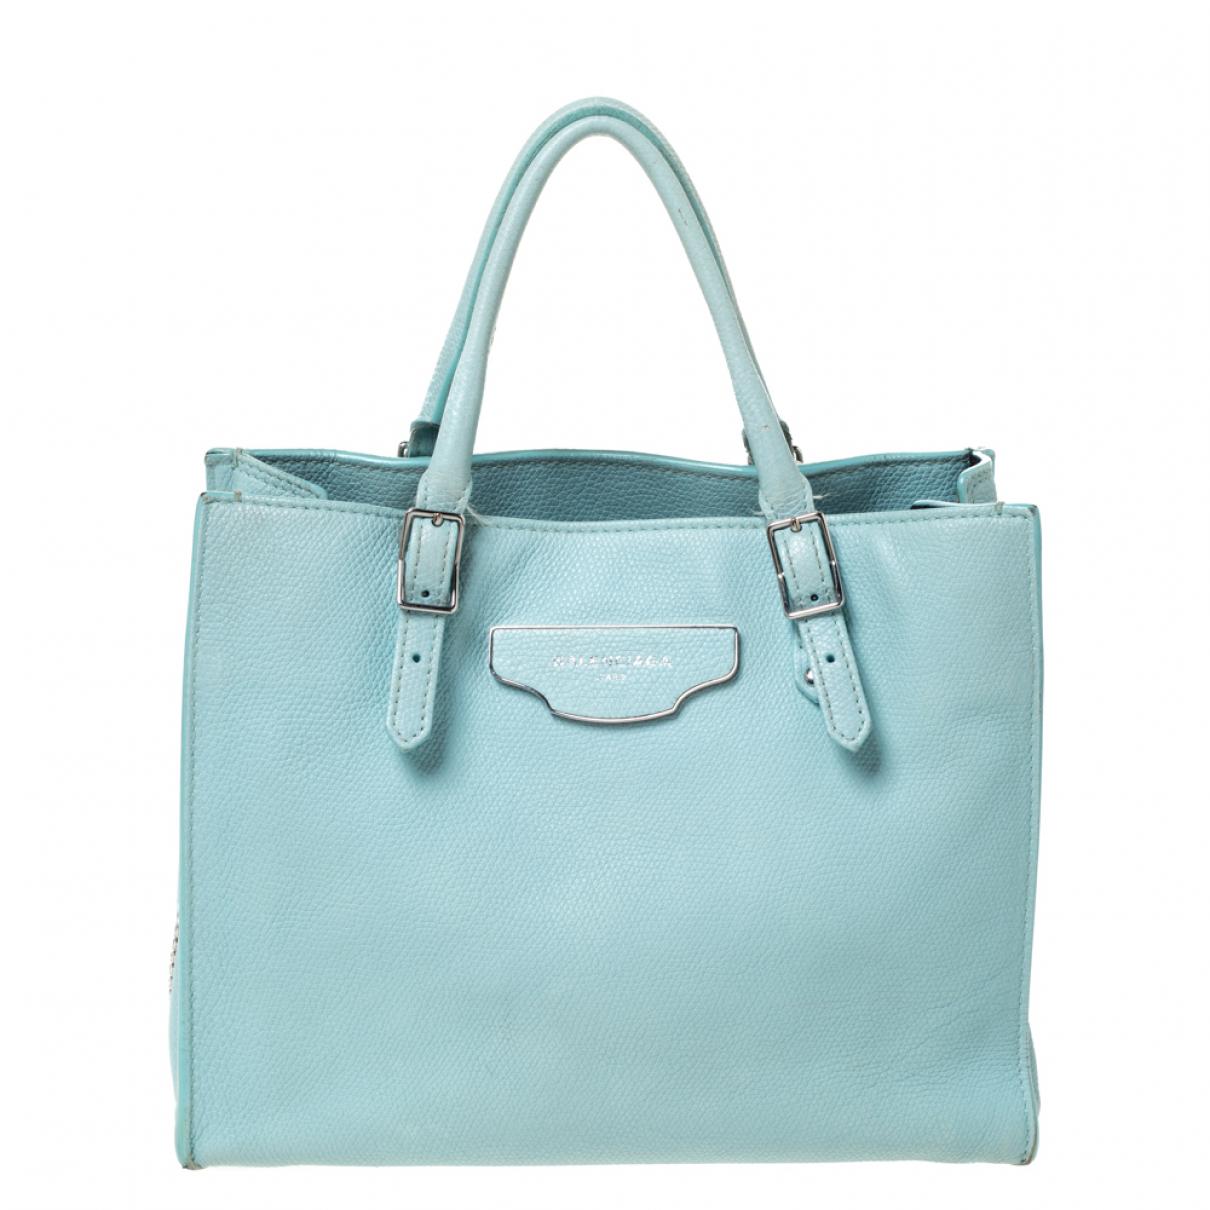 Balenciaga \N Green Leather handbag for Women \N